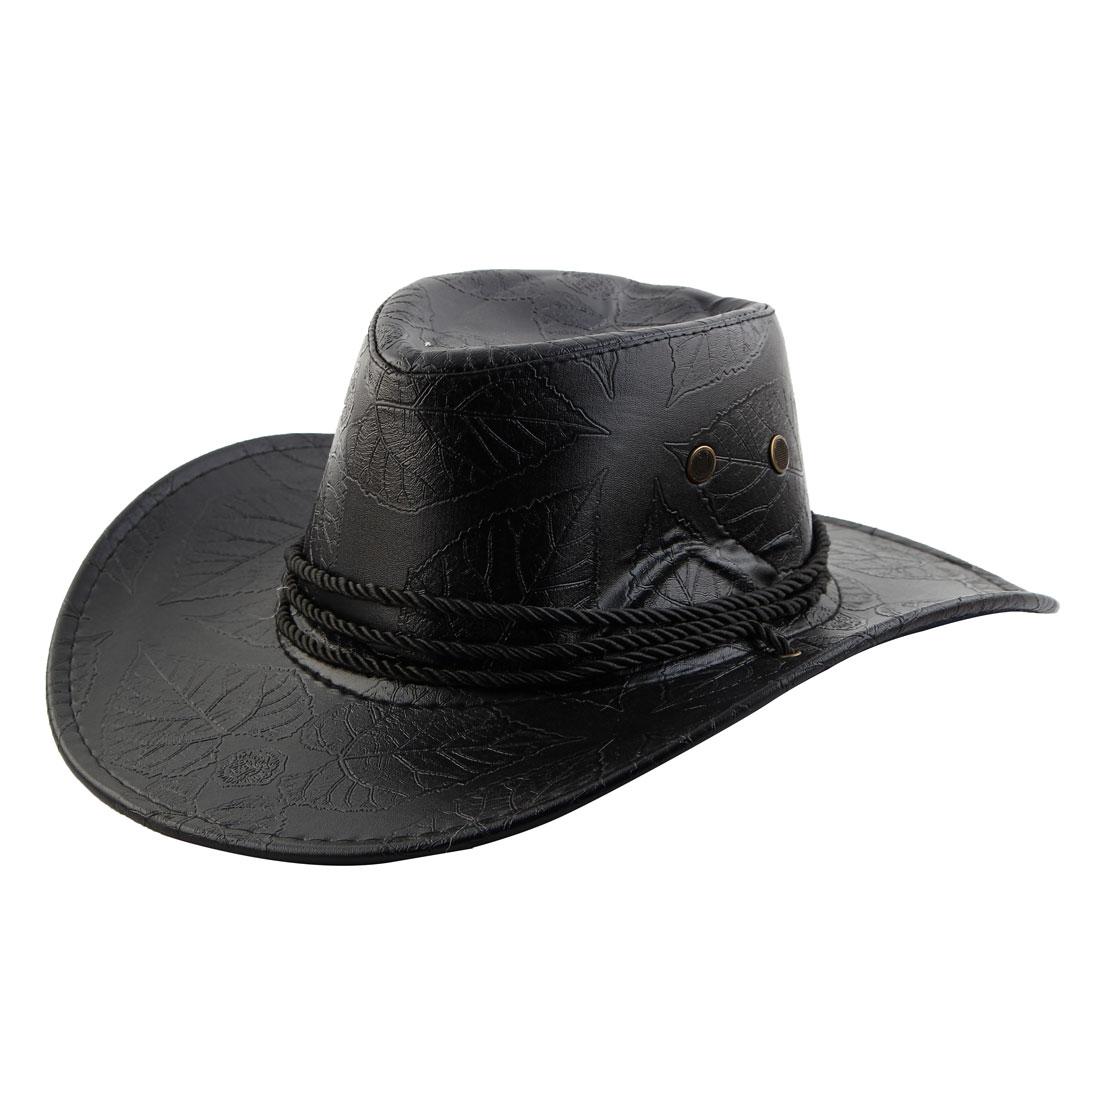 Unisex Faux Leather Adjustable Neck Strap Western Style Sunhat Cowboy Hat Black